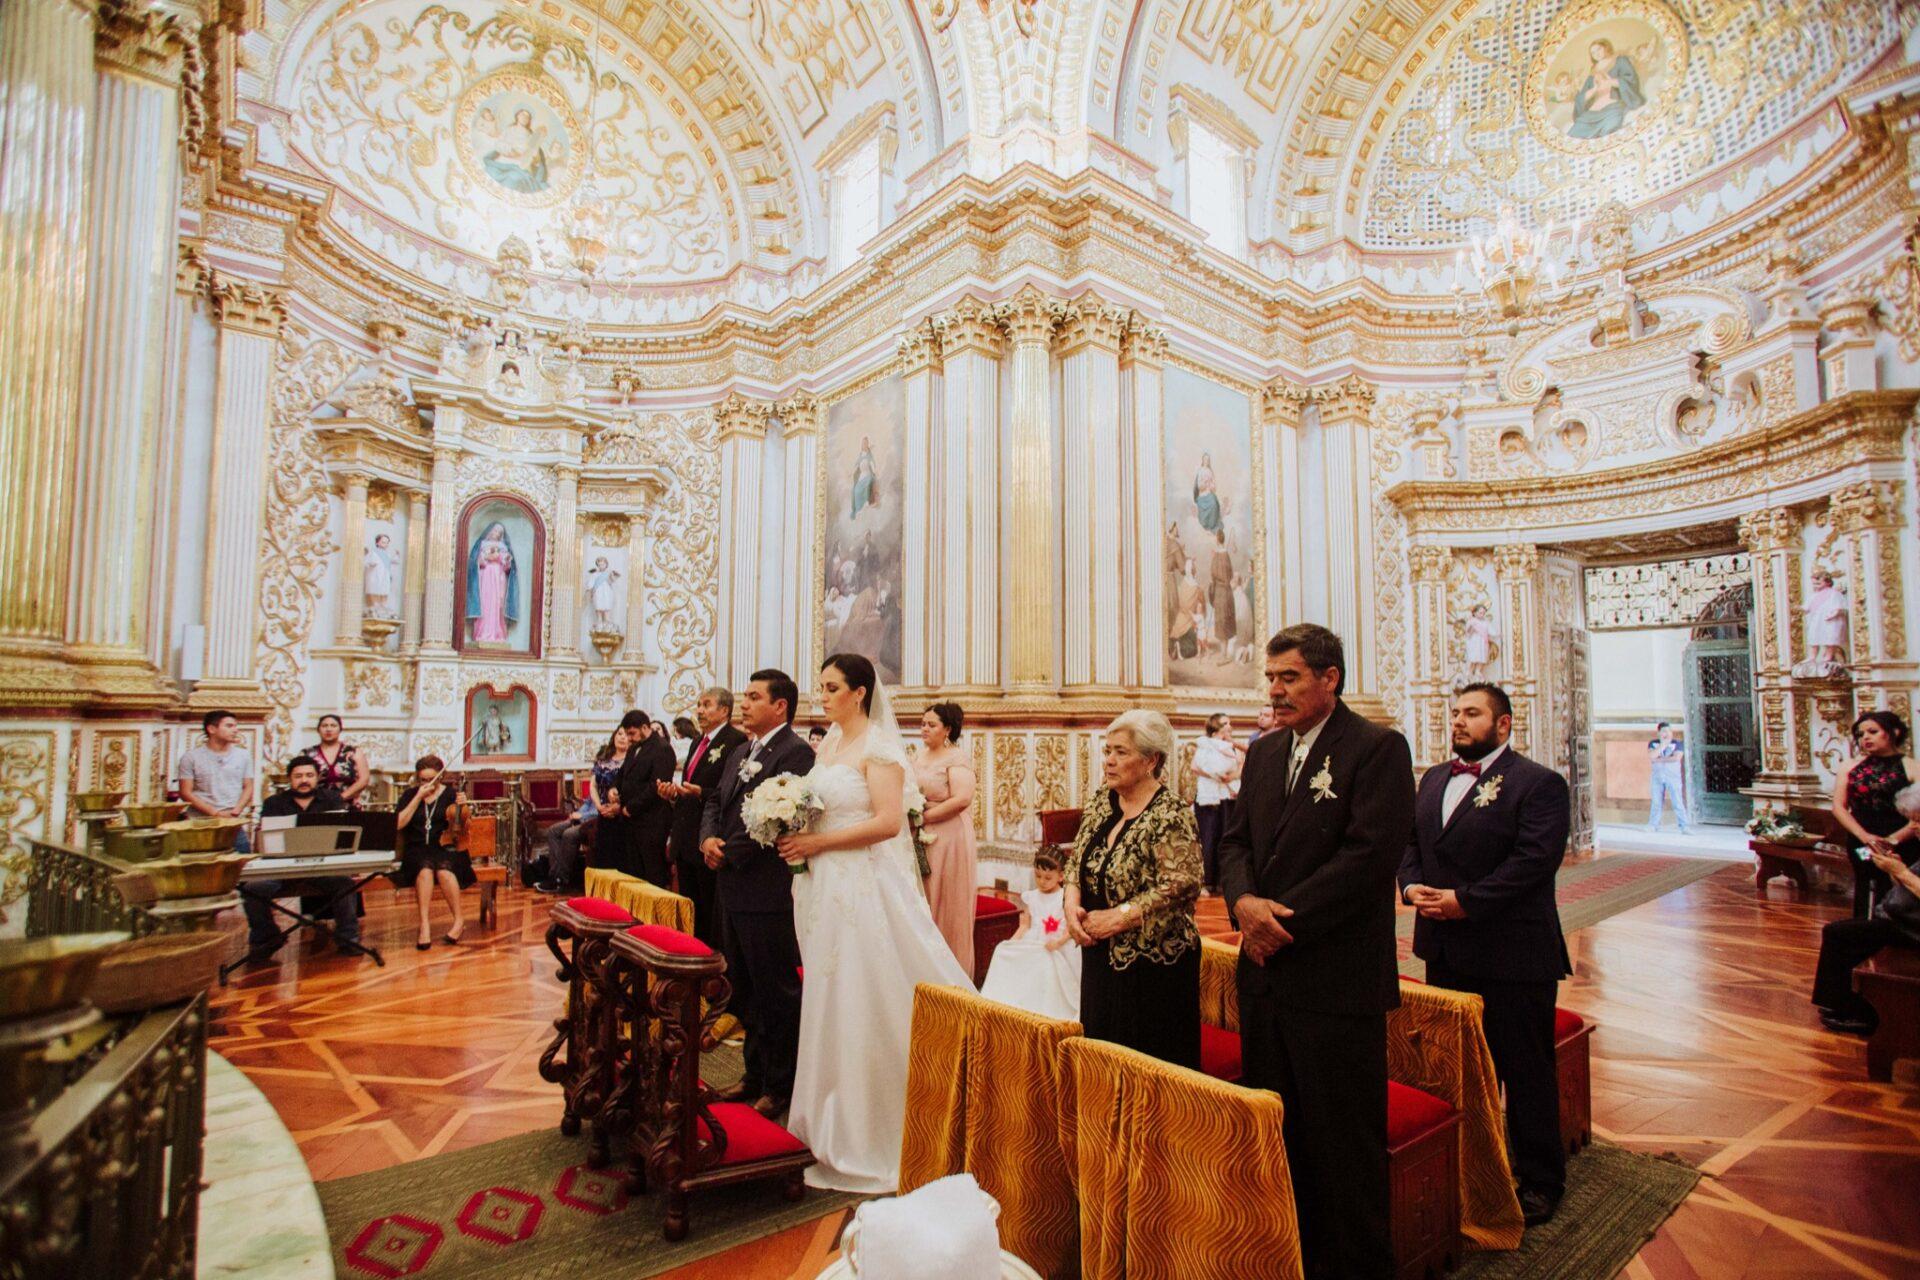 javier_noriega_fotografo_bodas_centro_platero_zacatecas_wedding_photographer8